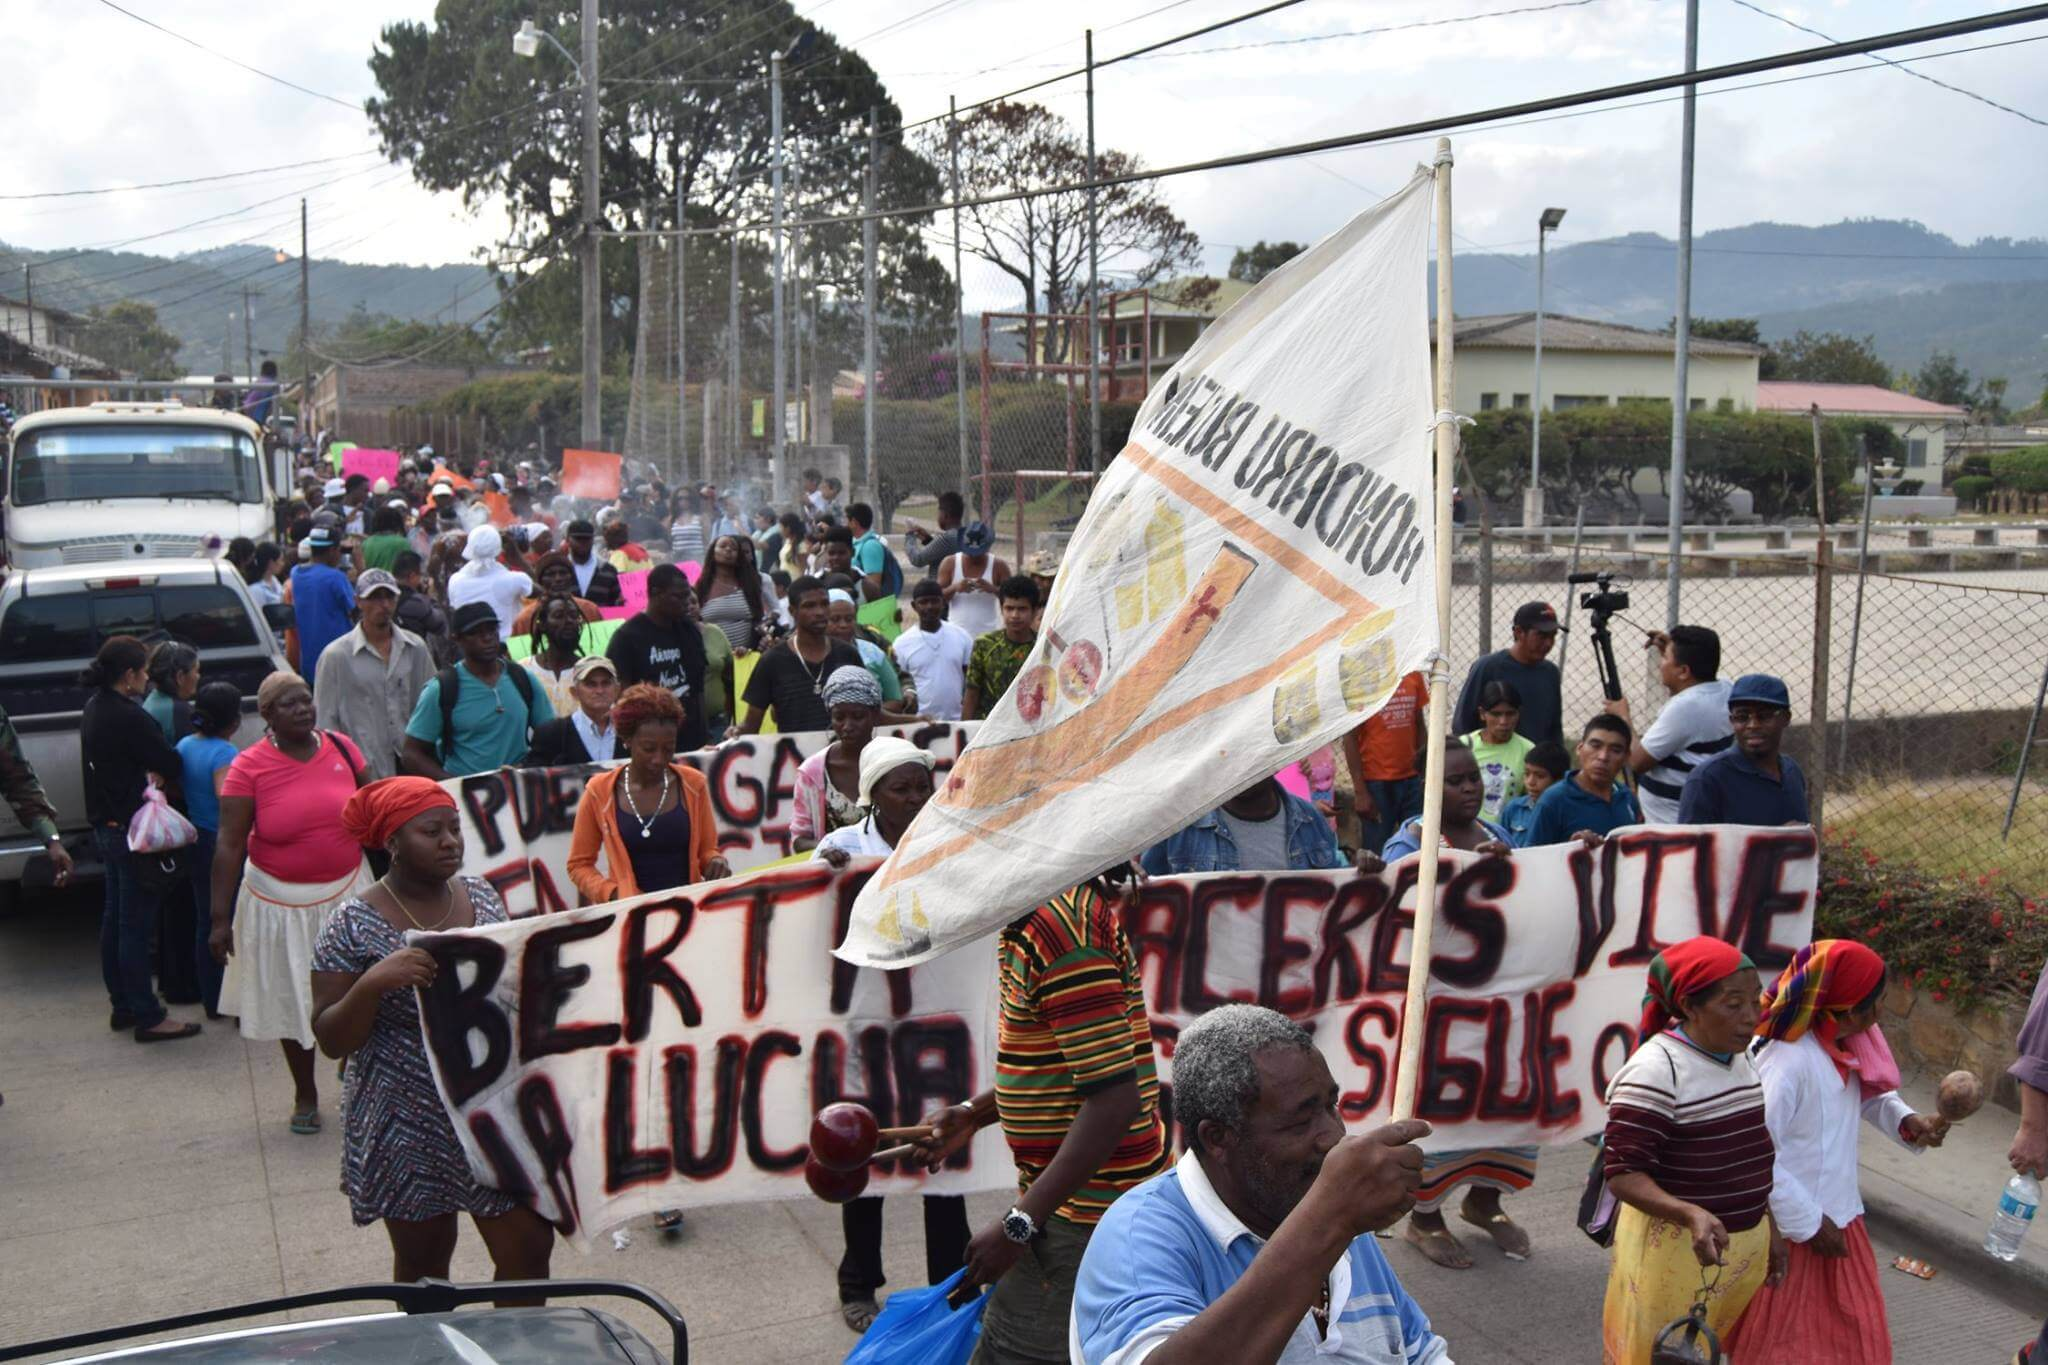 Berta solidaridad 3 Esepranza H